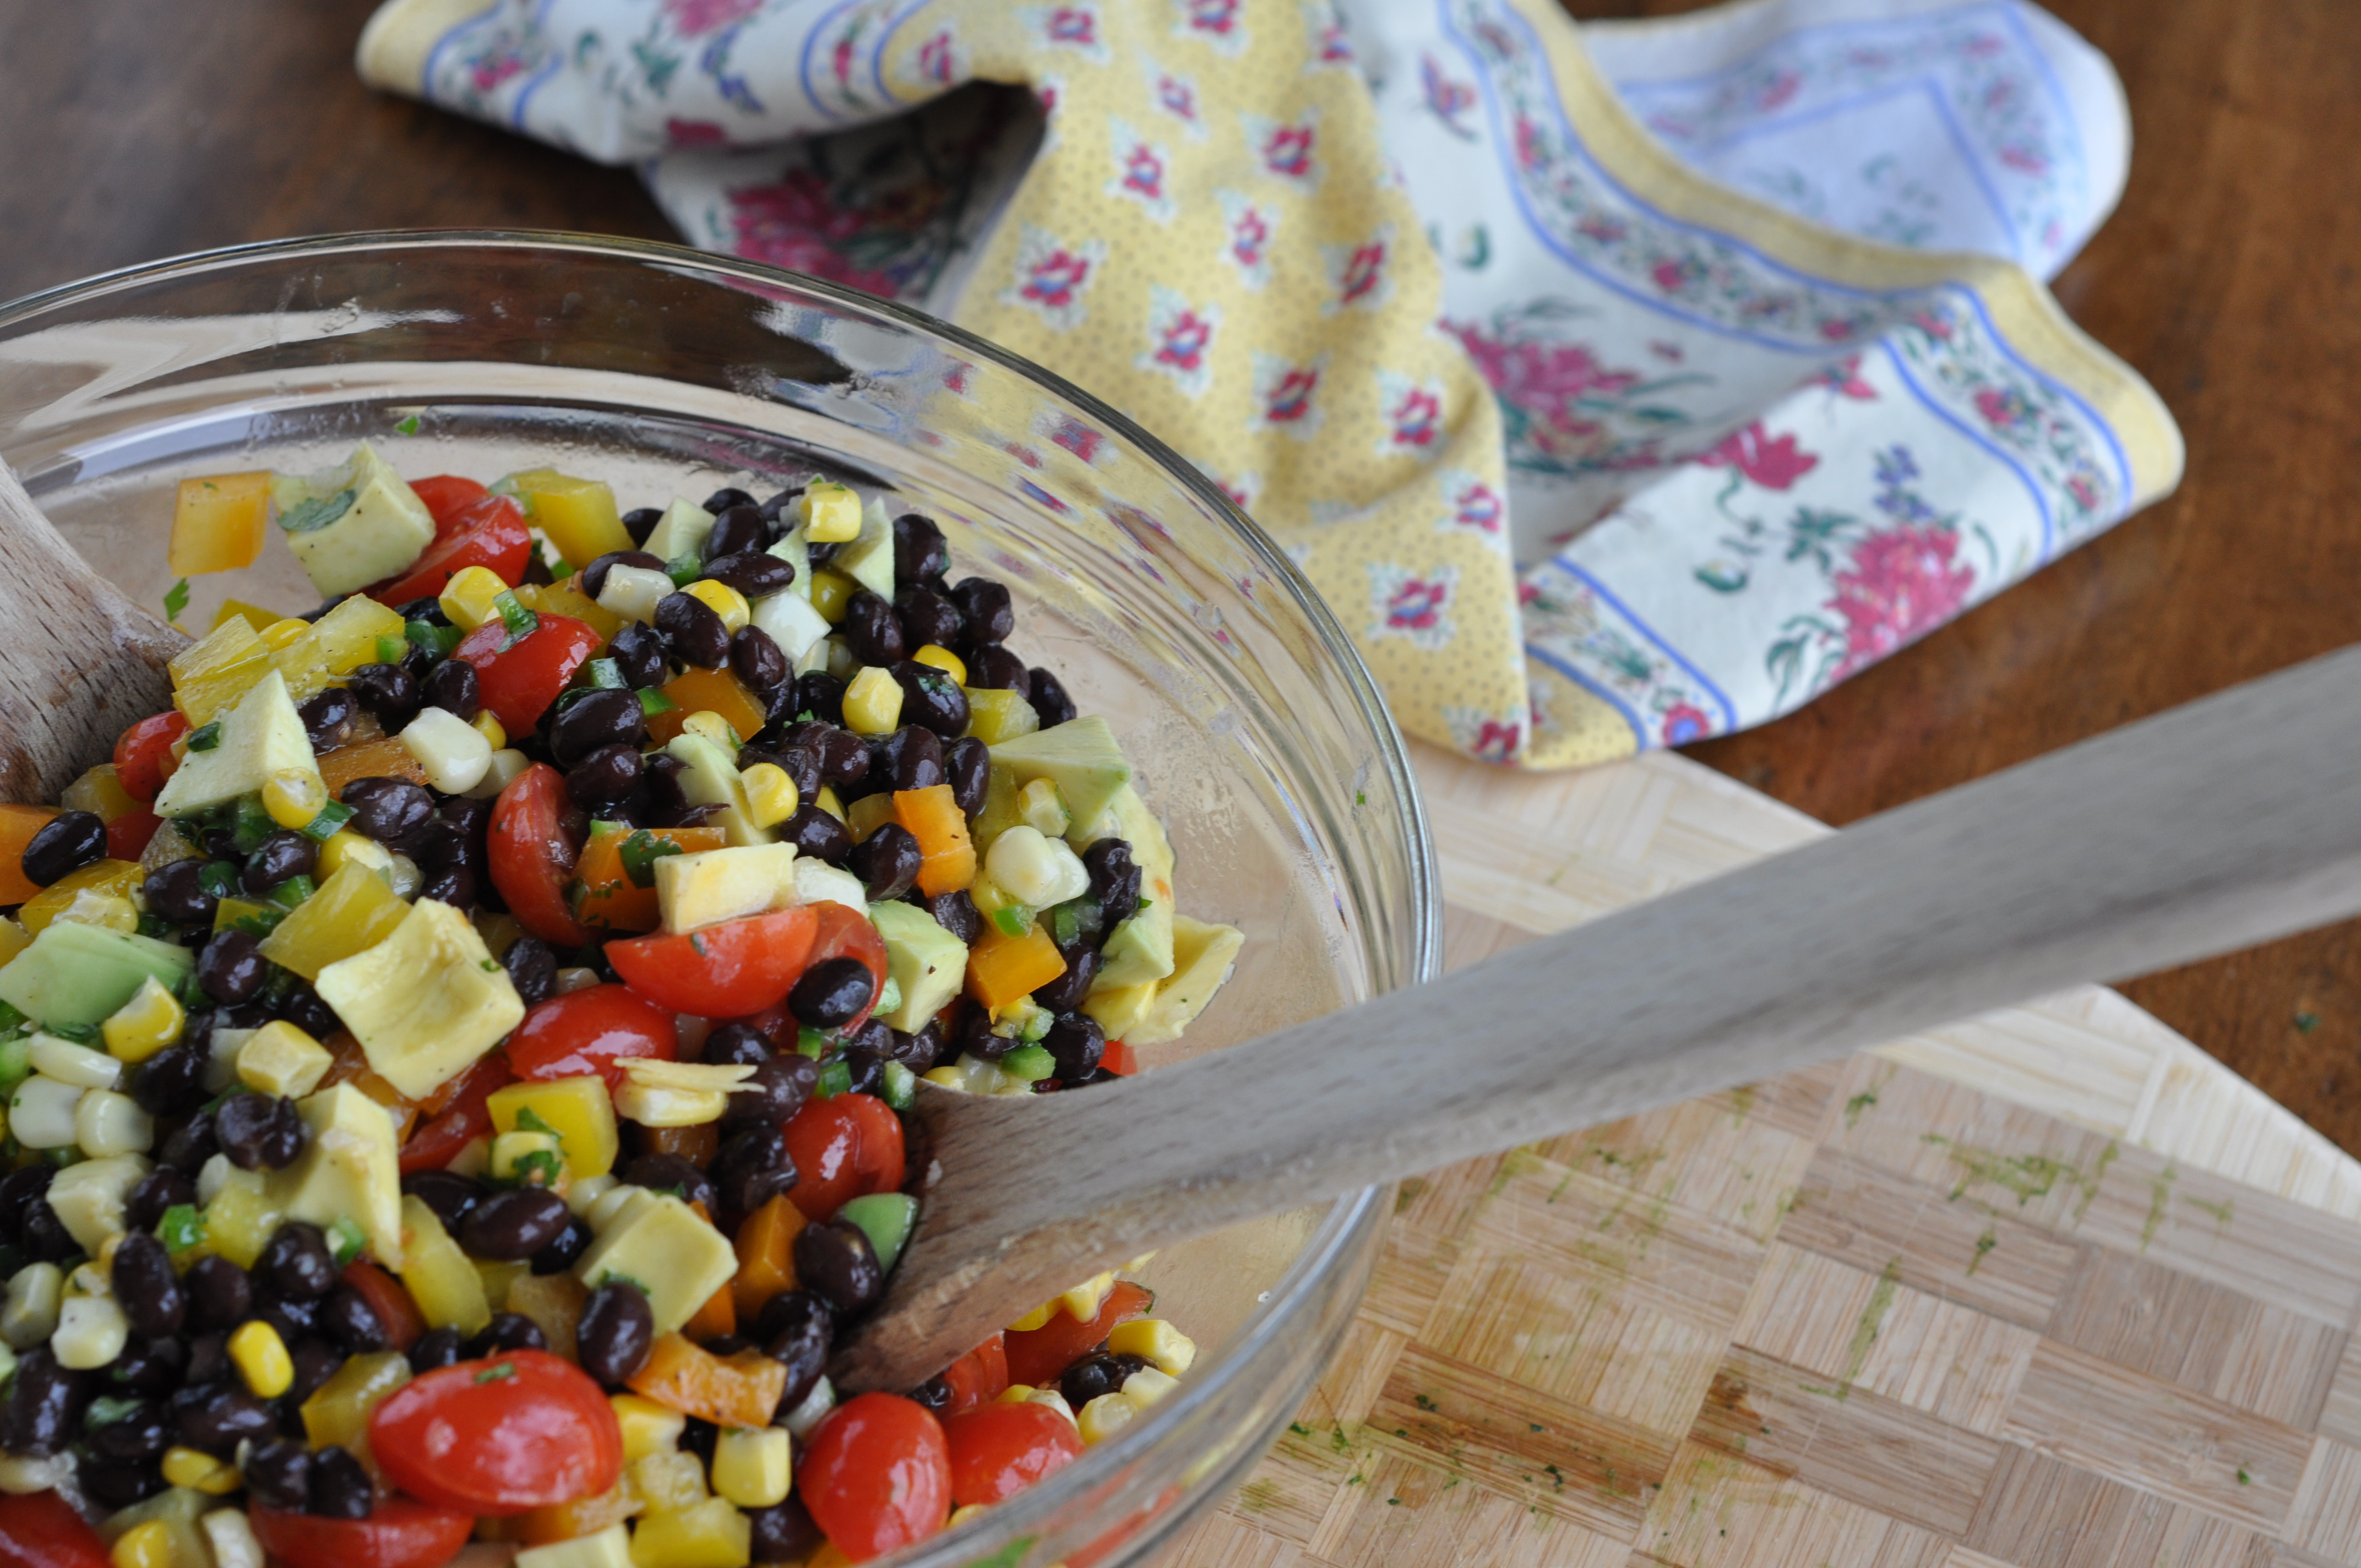 Barefoot Contessa Salad Recipes ina garten barefoot contessa salad recipes - food salad recipes